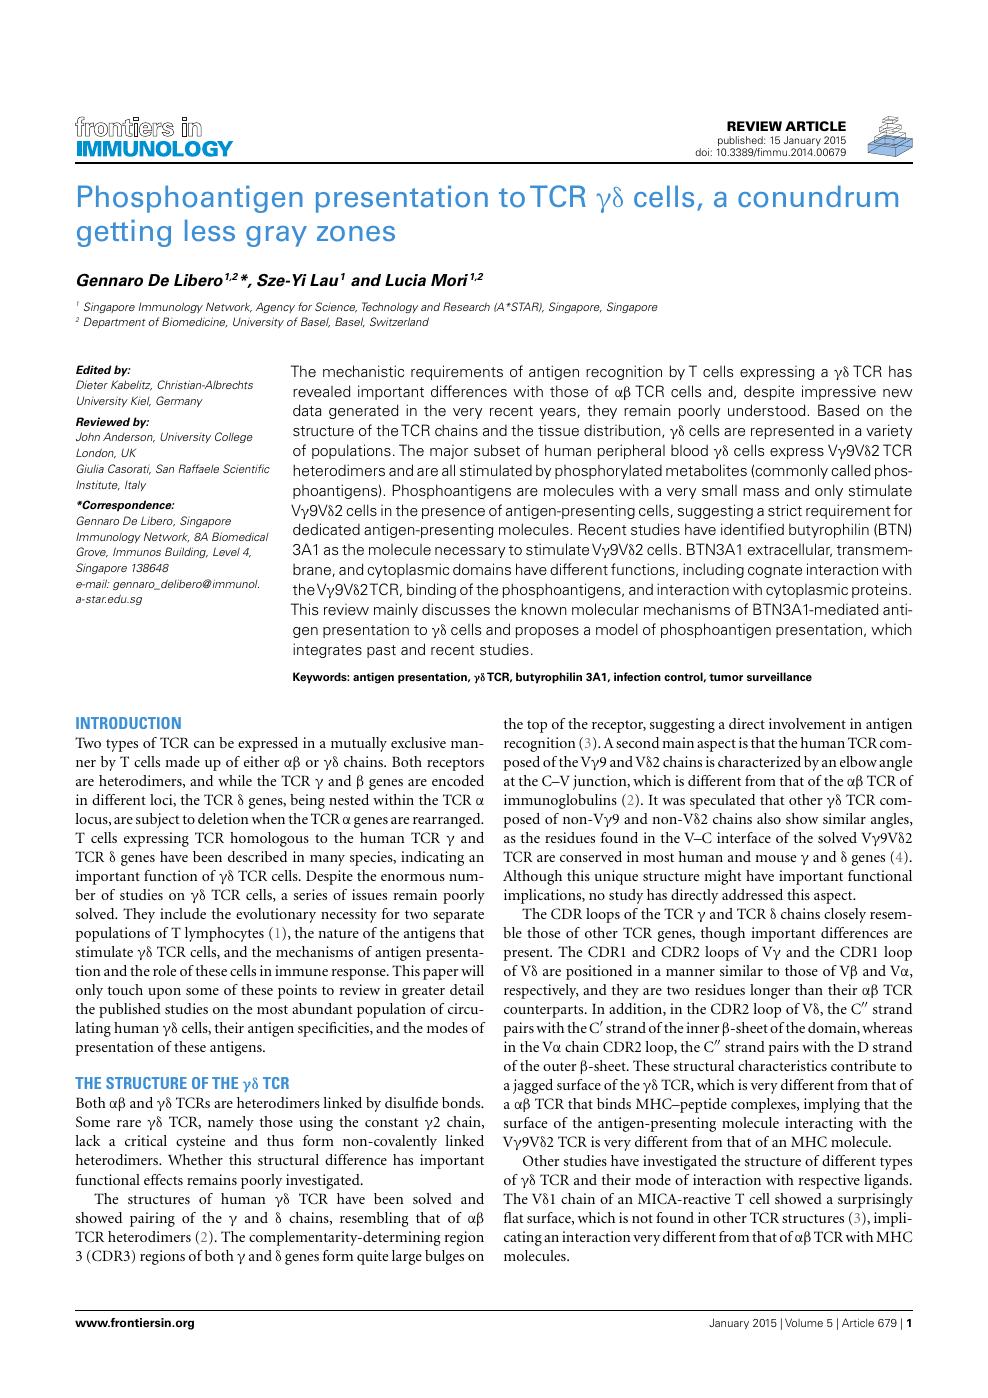 Phosphoantigen Presentation to TCR γδ Cells, a Conundrum